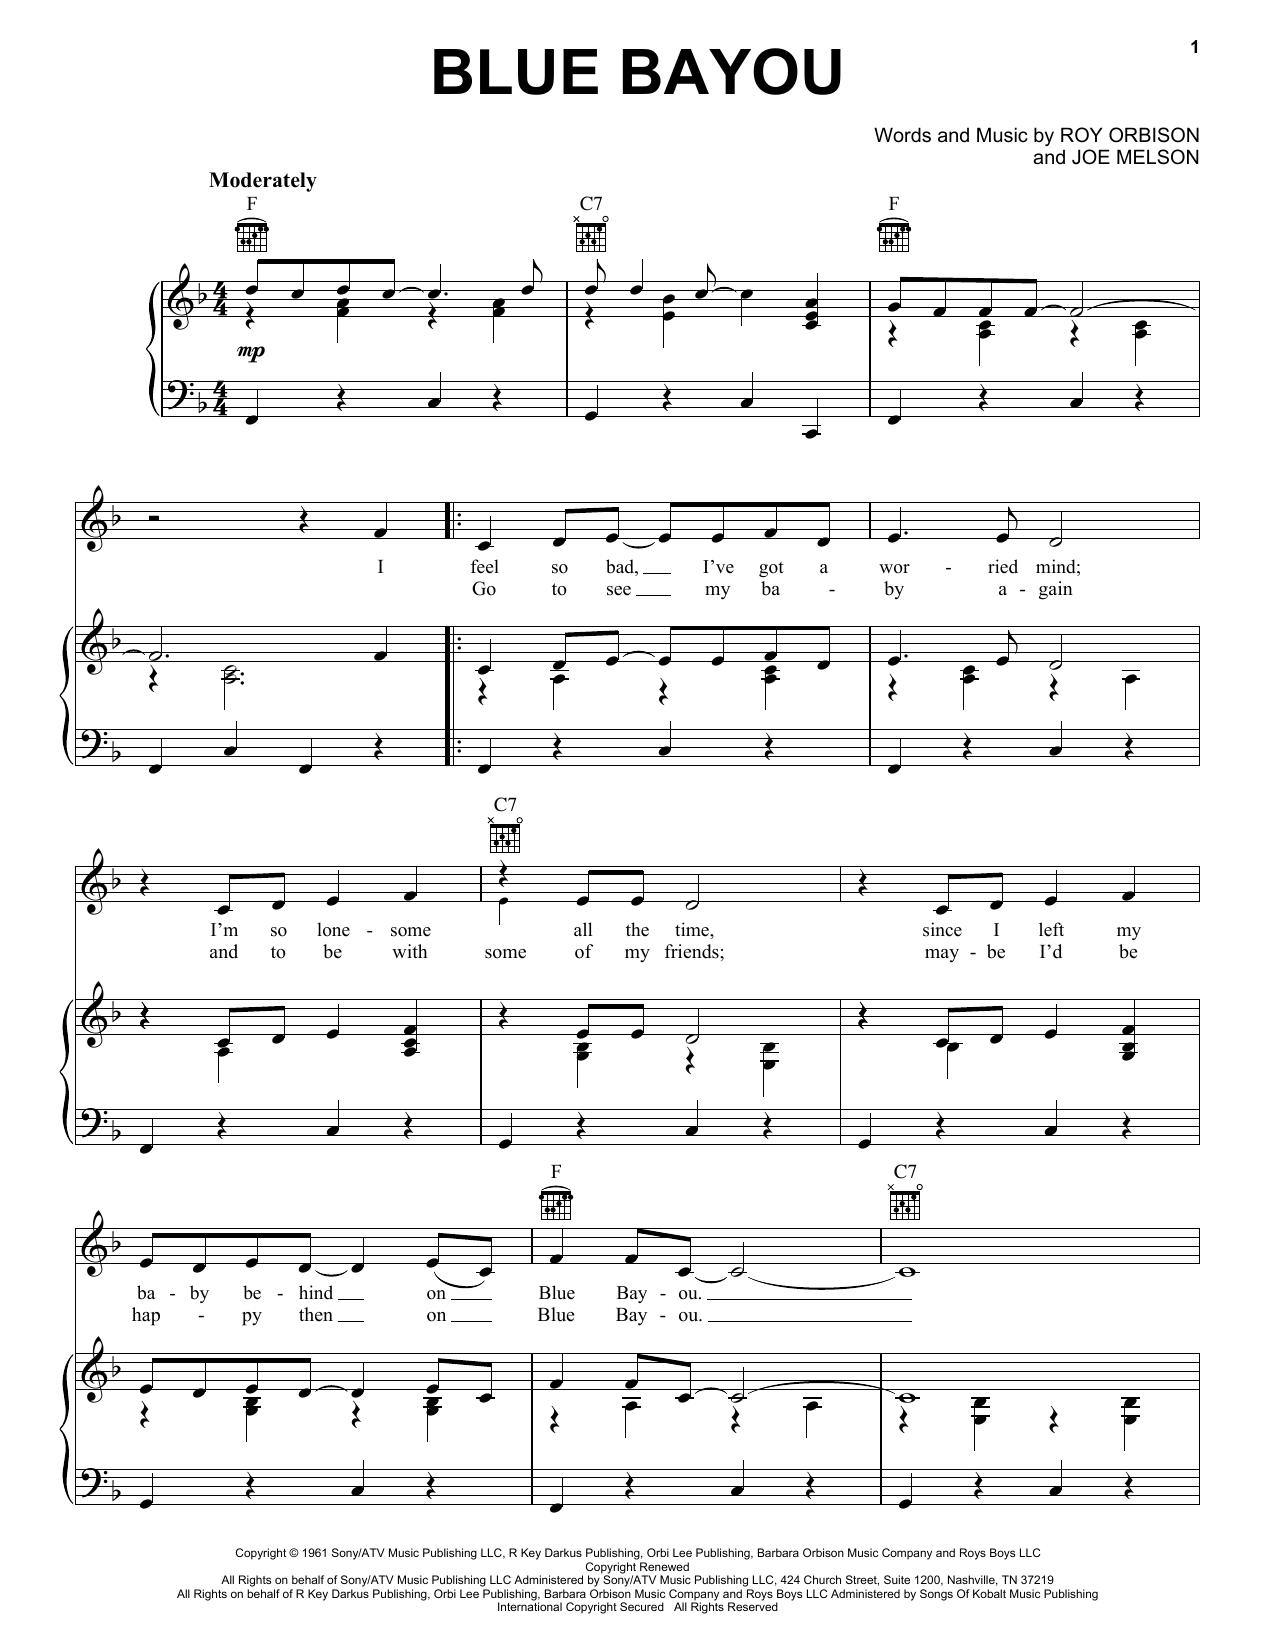 Linda Ronstadt Blue Bayou sheet music notes and chords